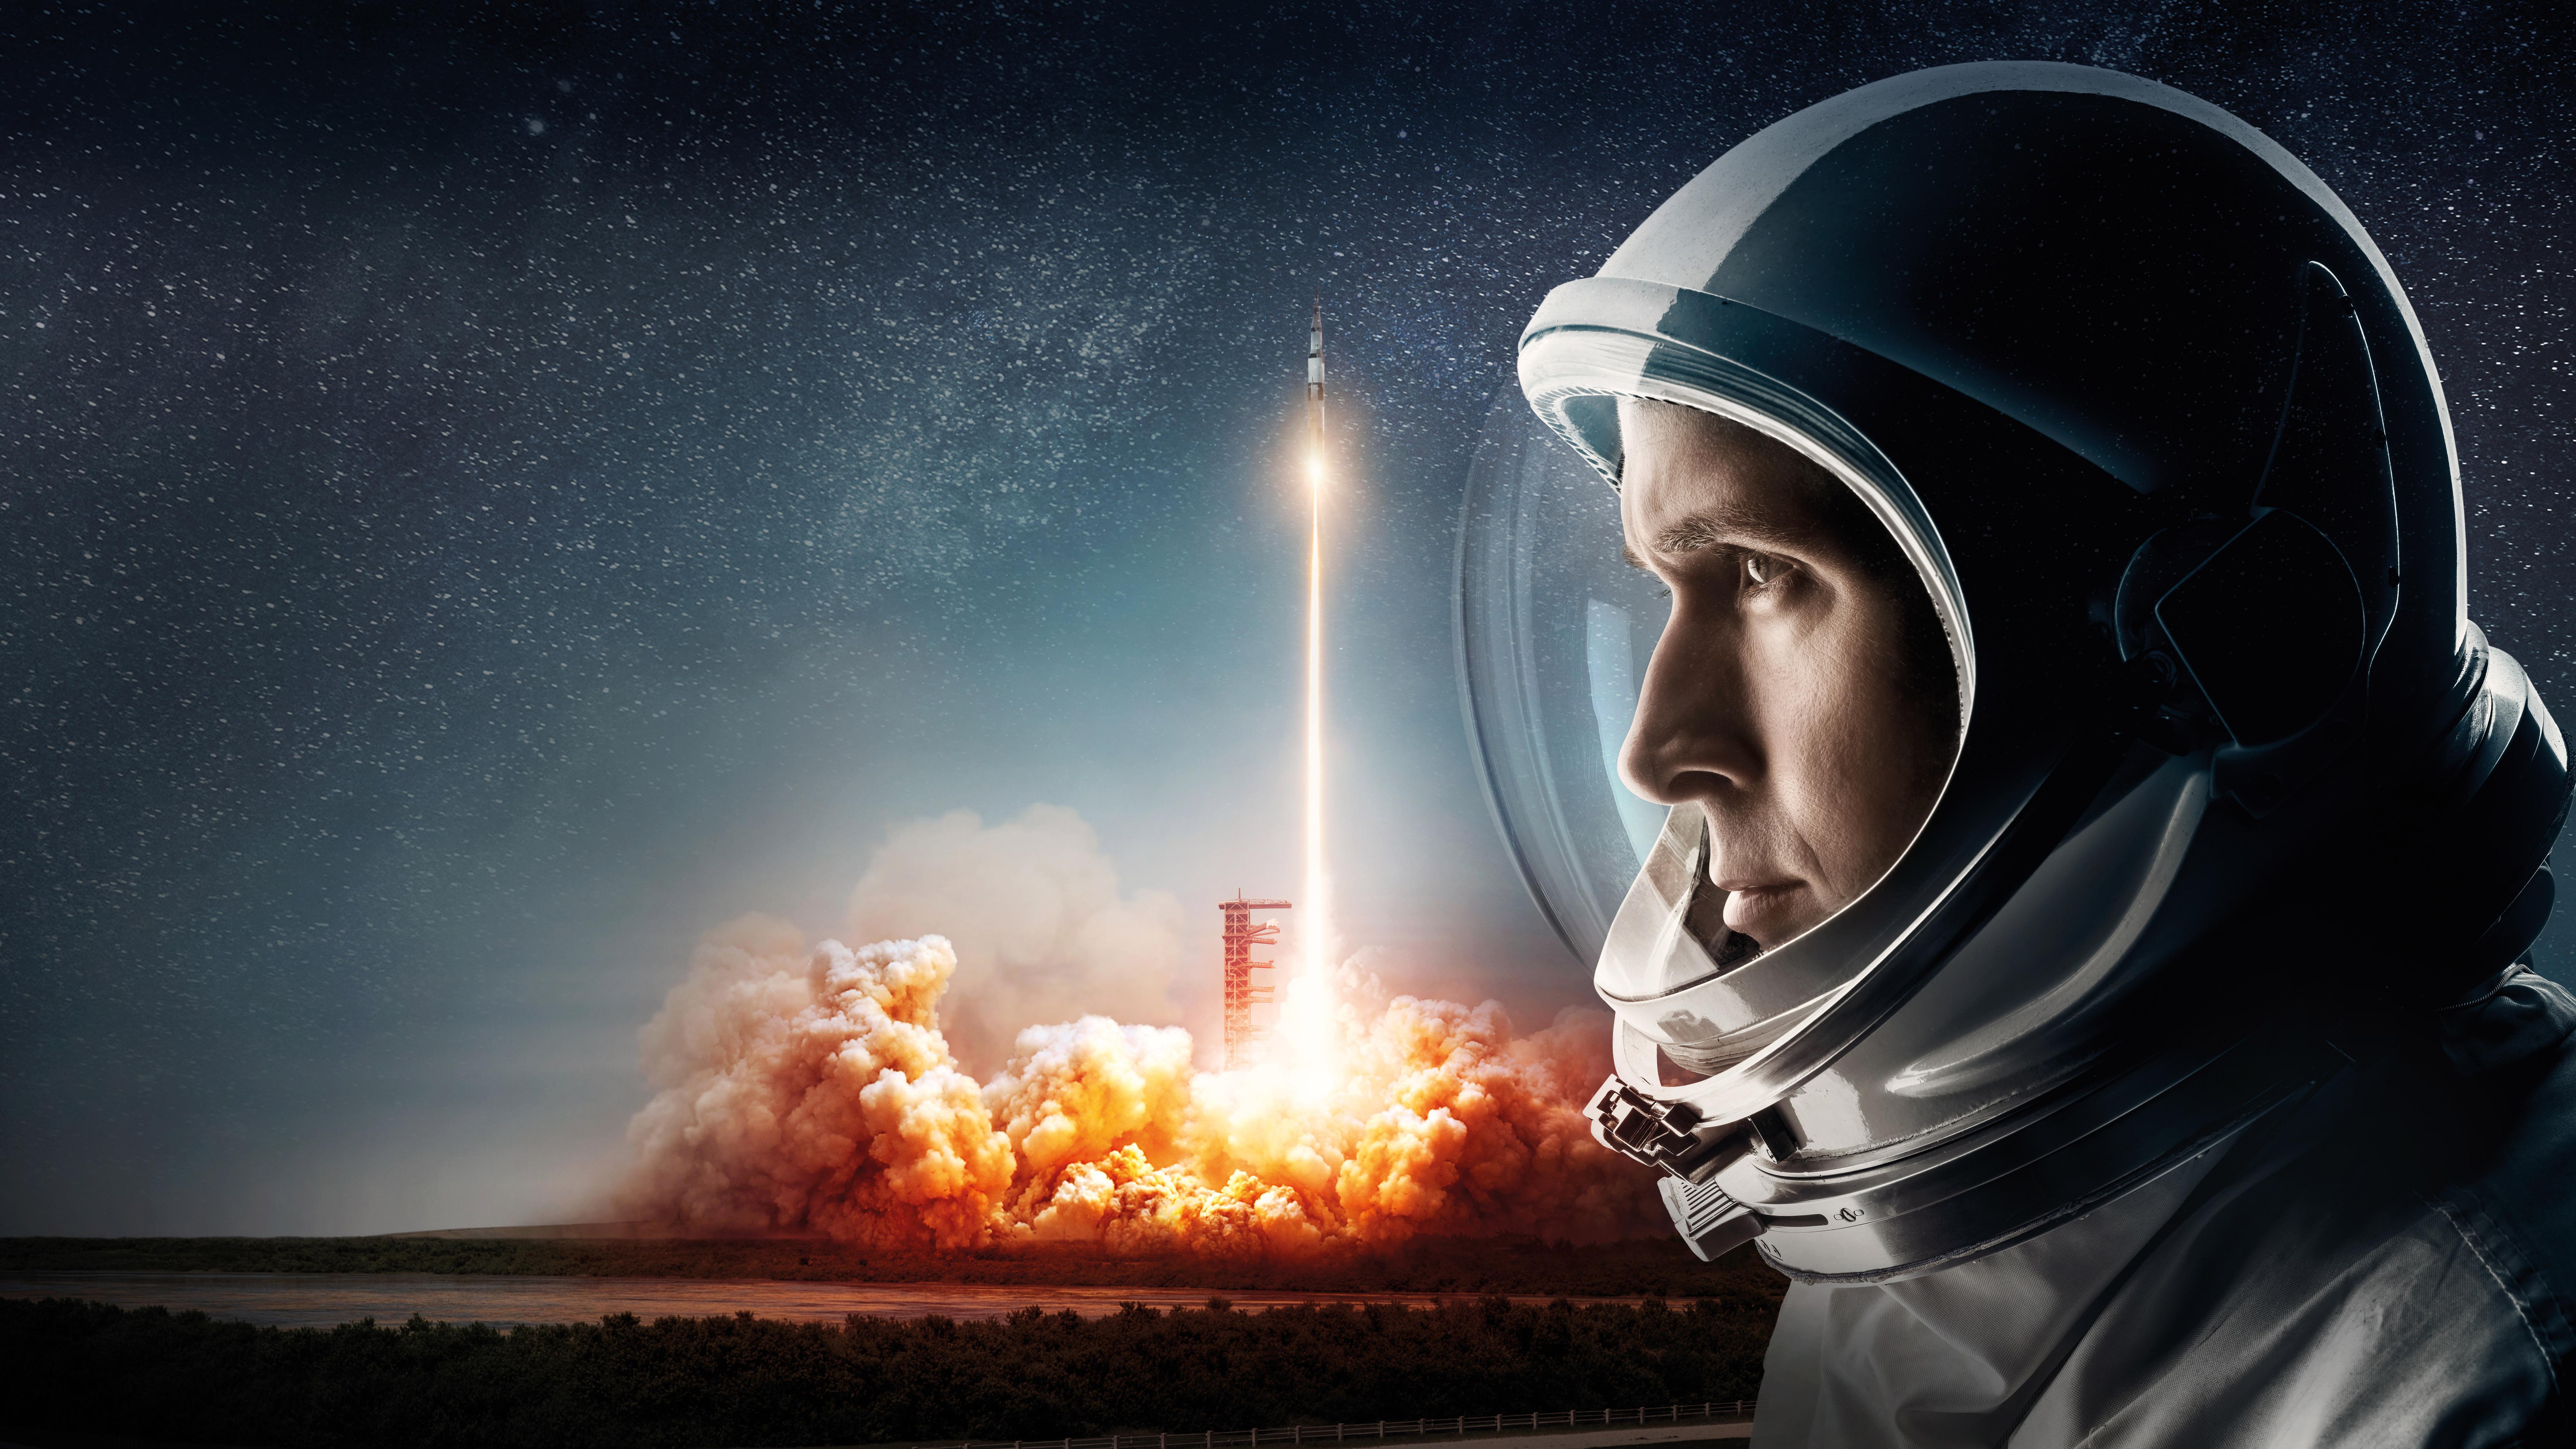 first-man-movie-2018-12k-5u.jpg